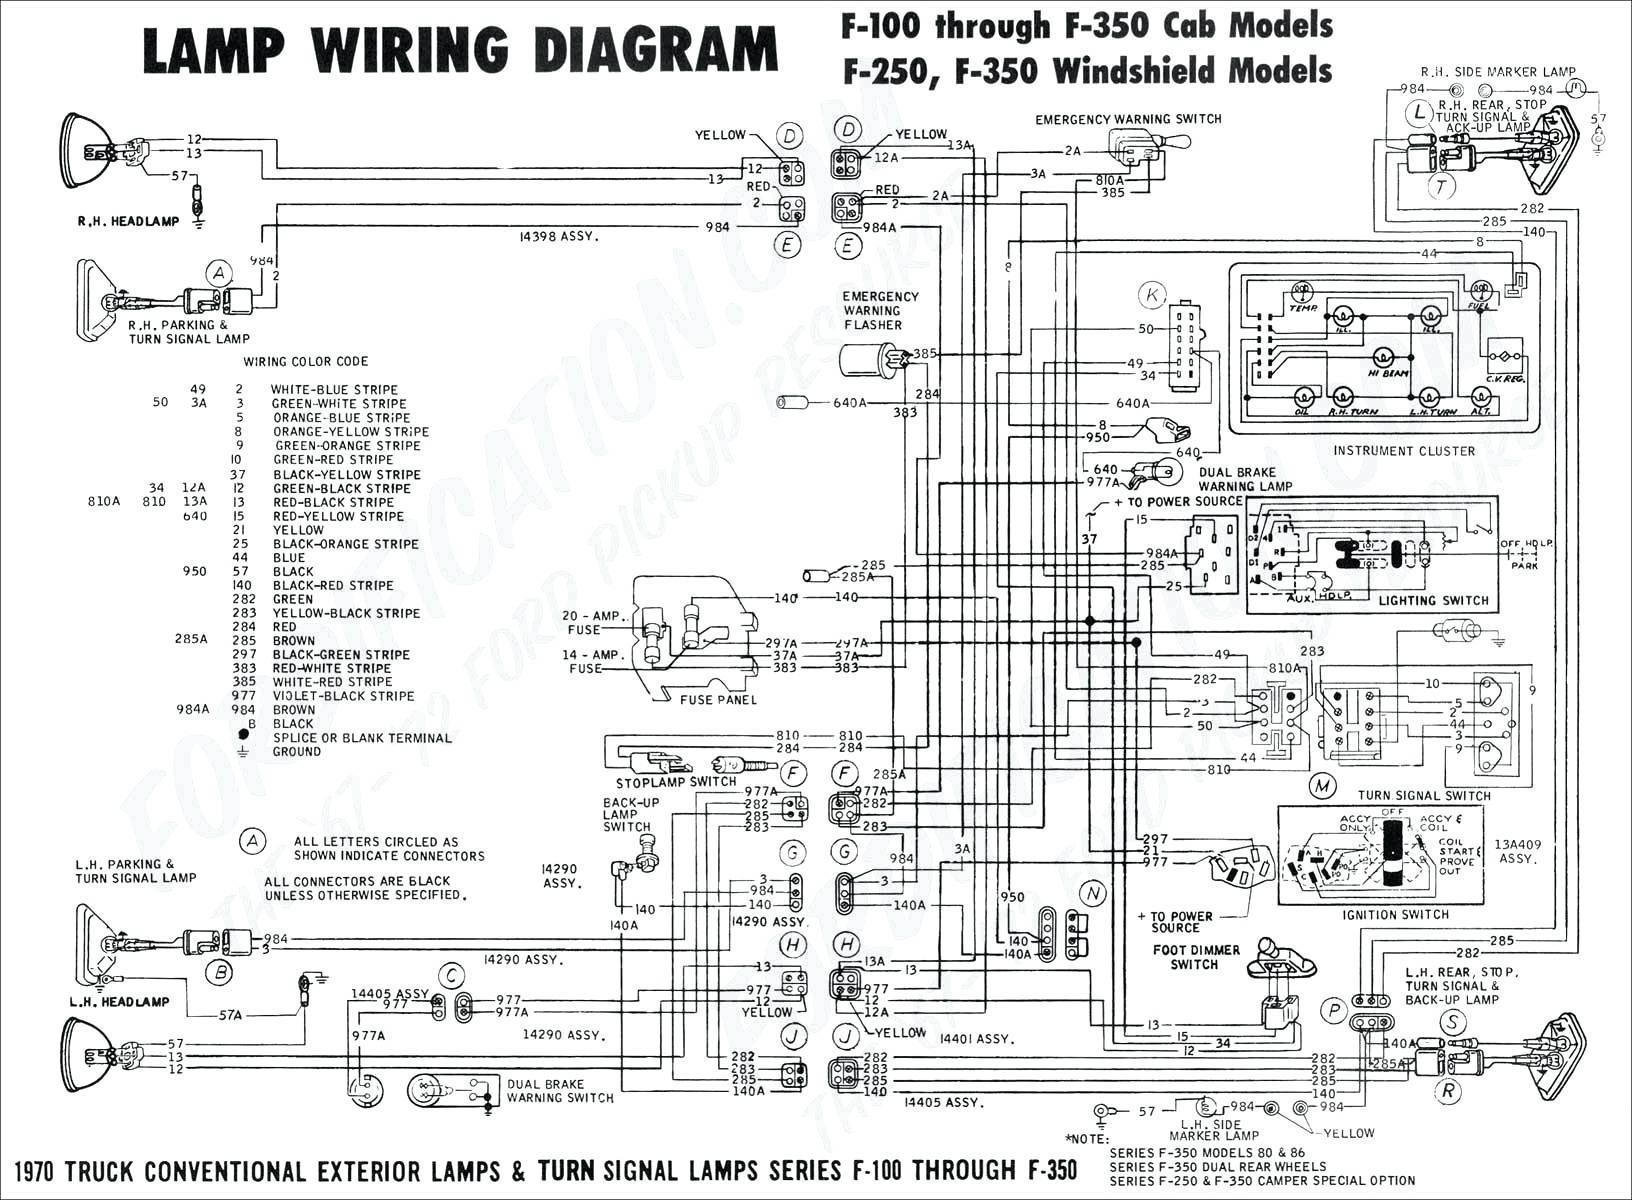 2016 Dodge Ram 1500 Generator Schematic 2016 Ram 1500 Wiring Diagram Database Of 2016 Dodge Ram 1500 Generator Schematic